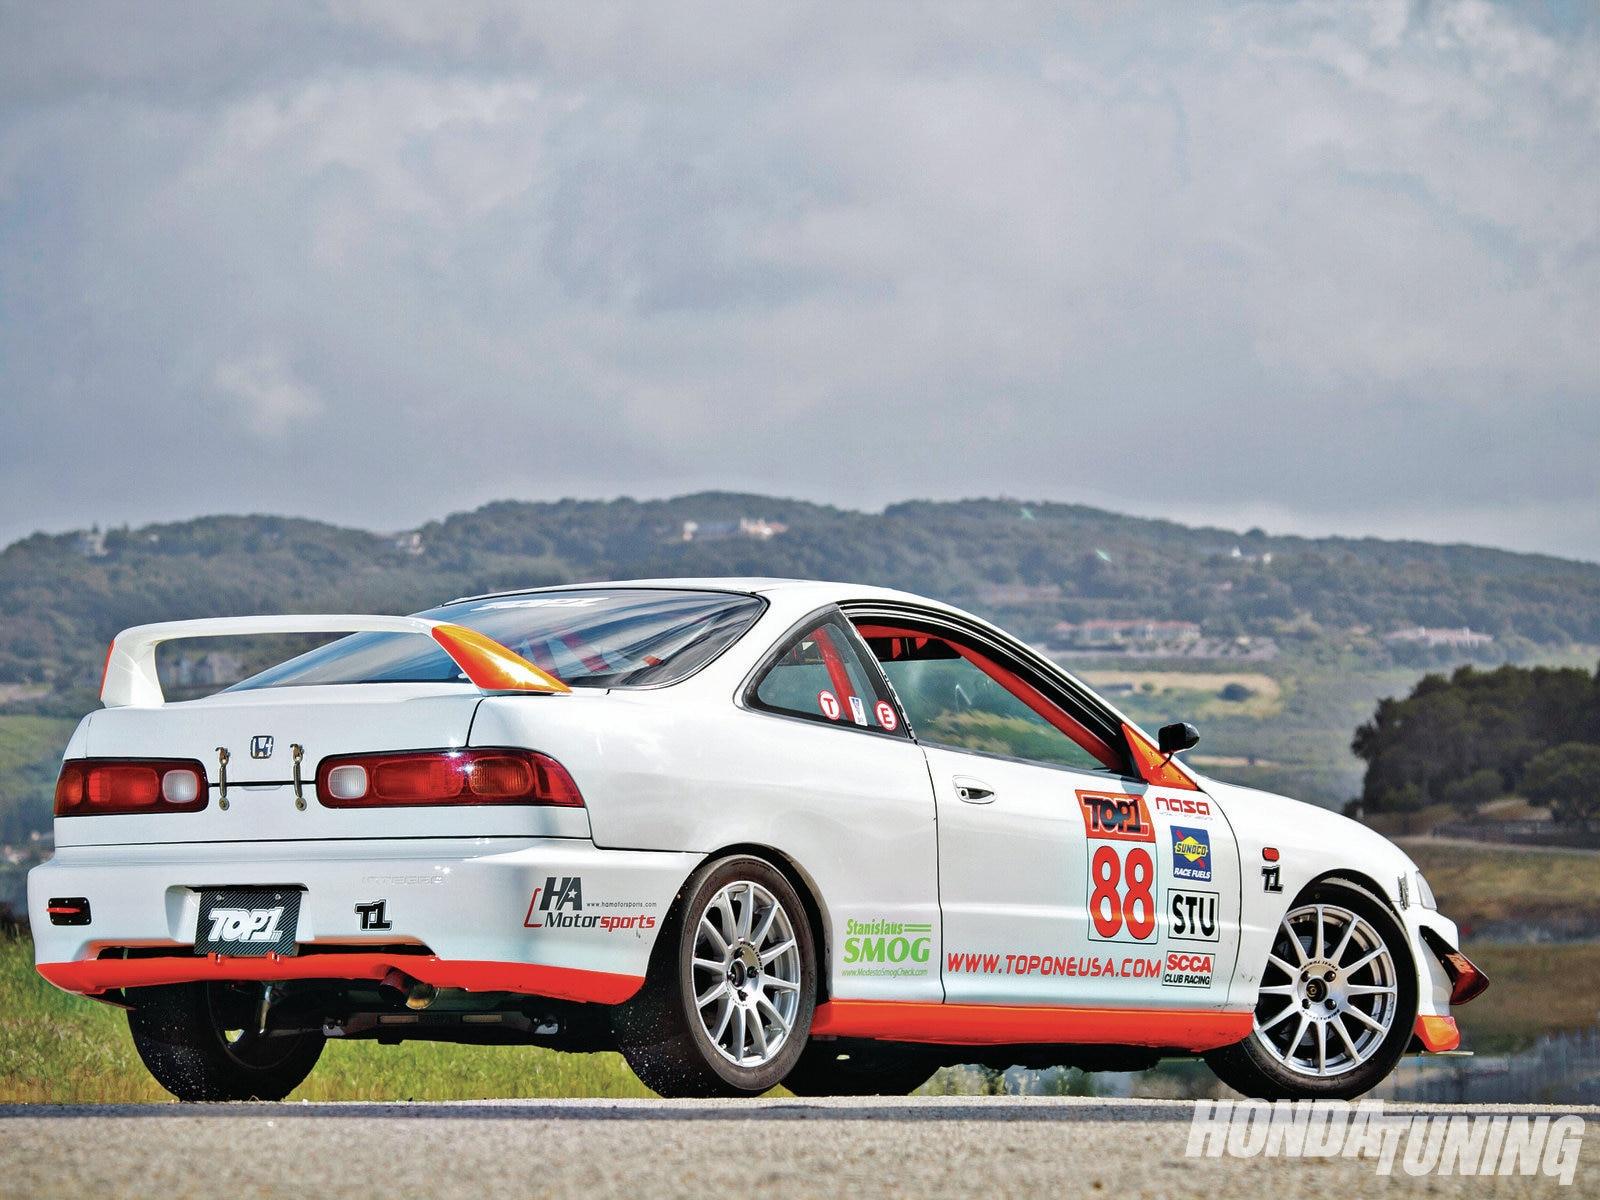 1994 Acura Integra Gs R Hands On Approach Honda Tuning Magazine